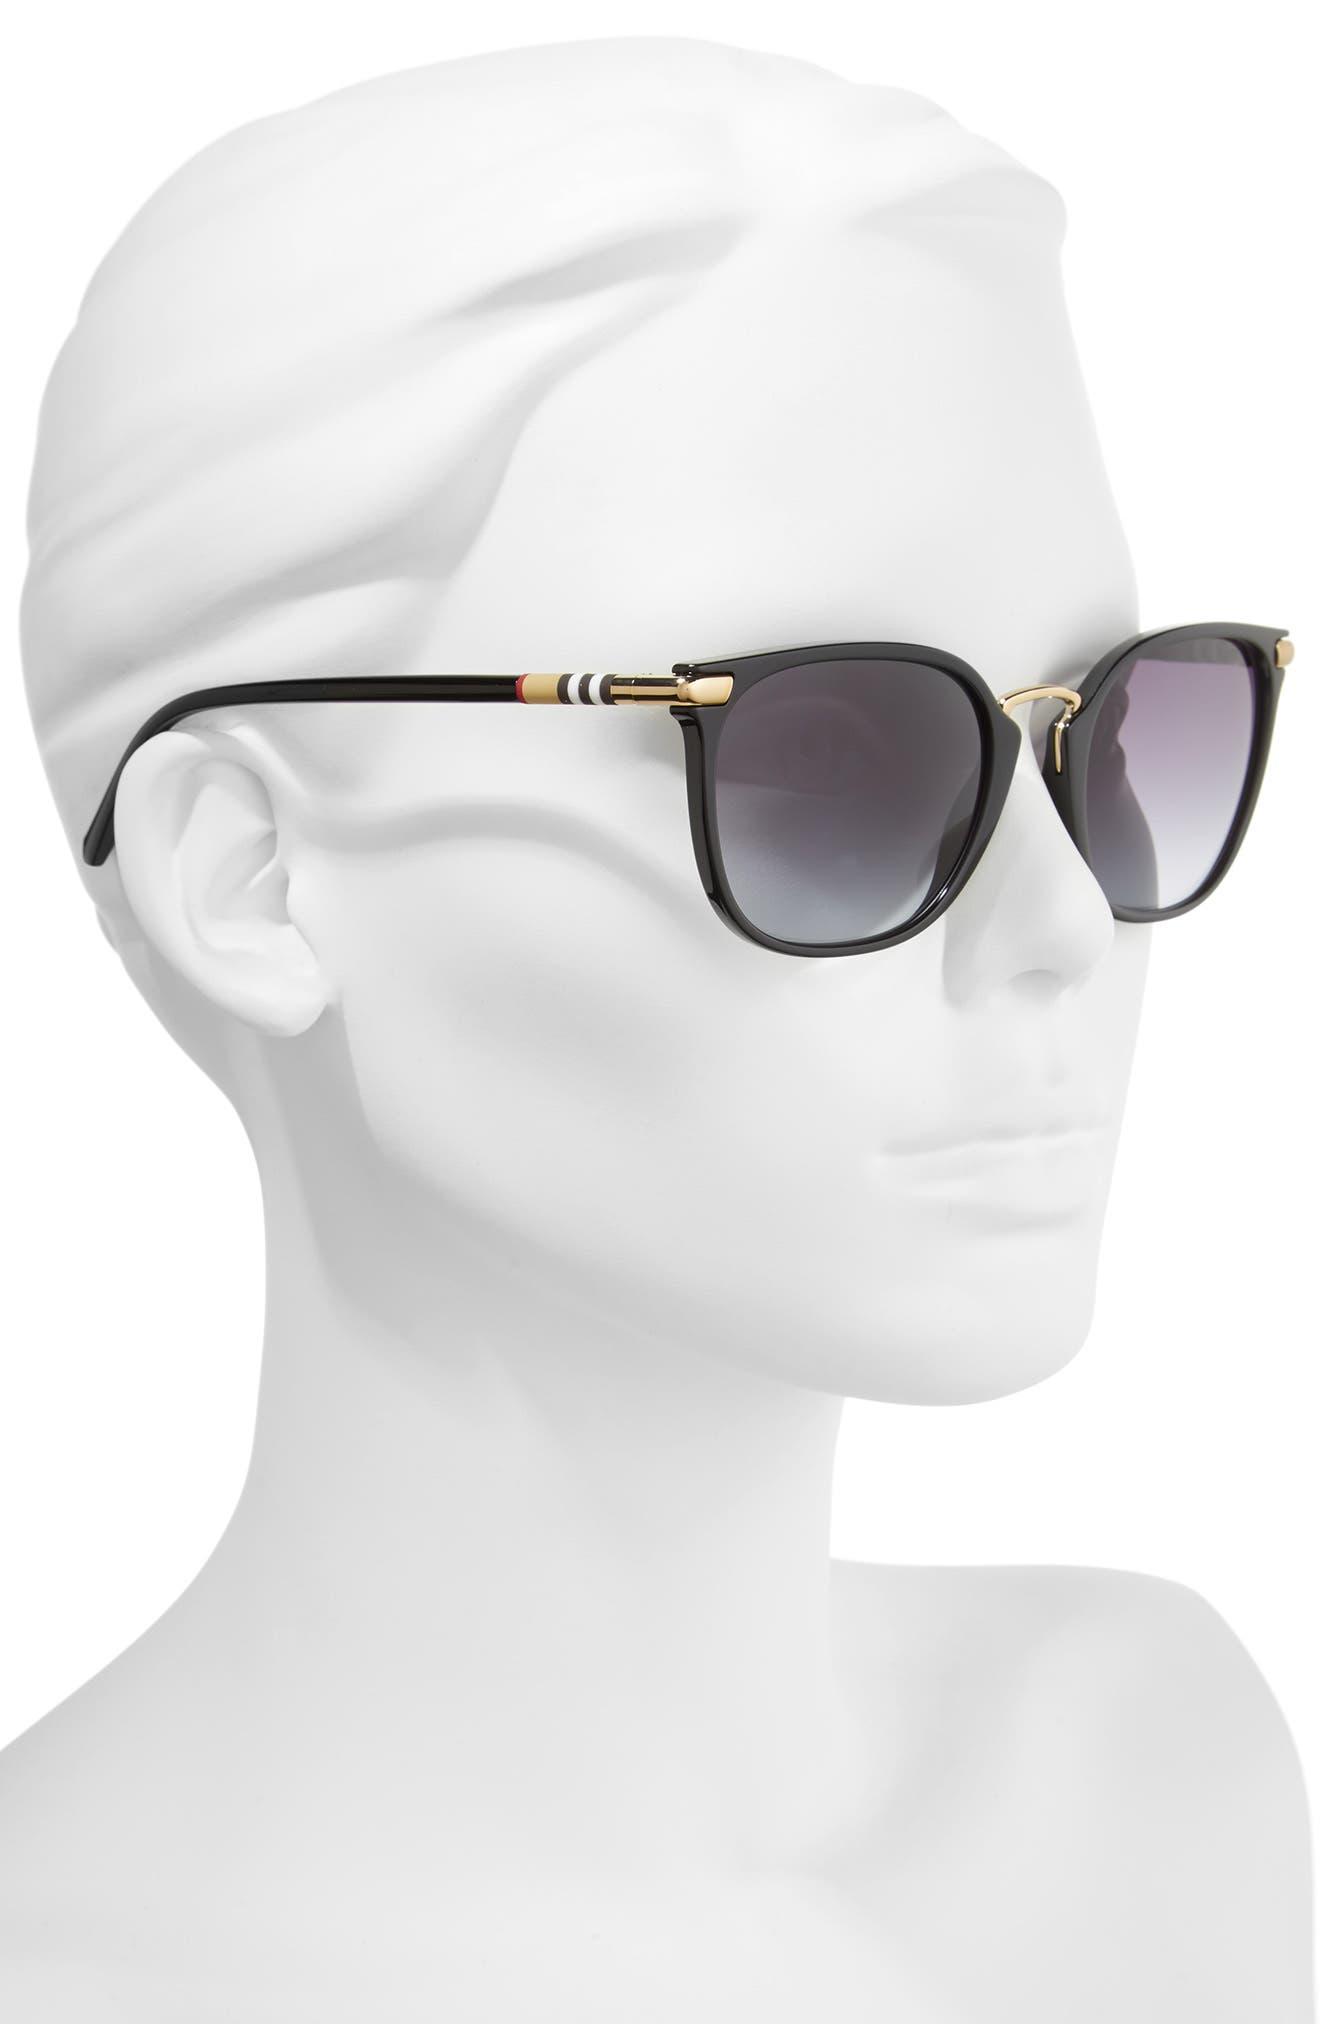 53mm Gradient Square Sunglasses,                             Alternate thumbnail 7, color,